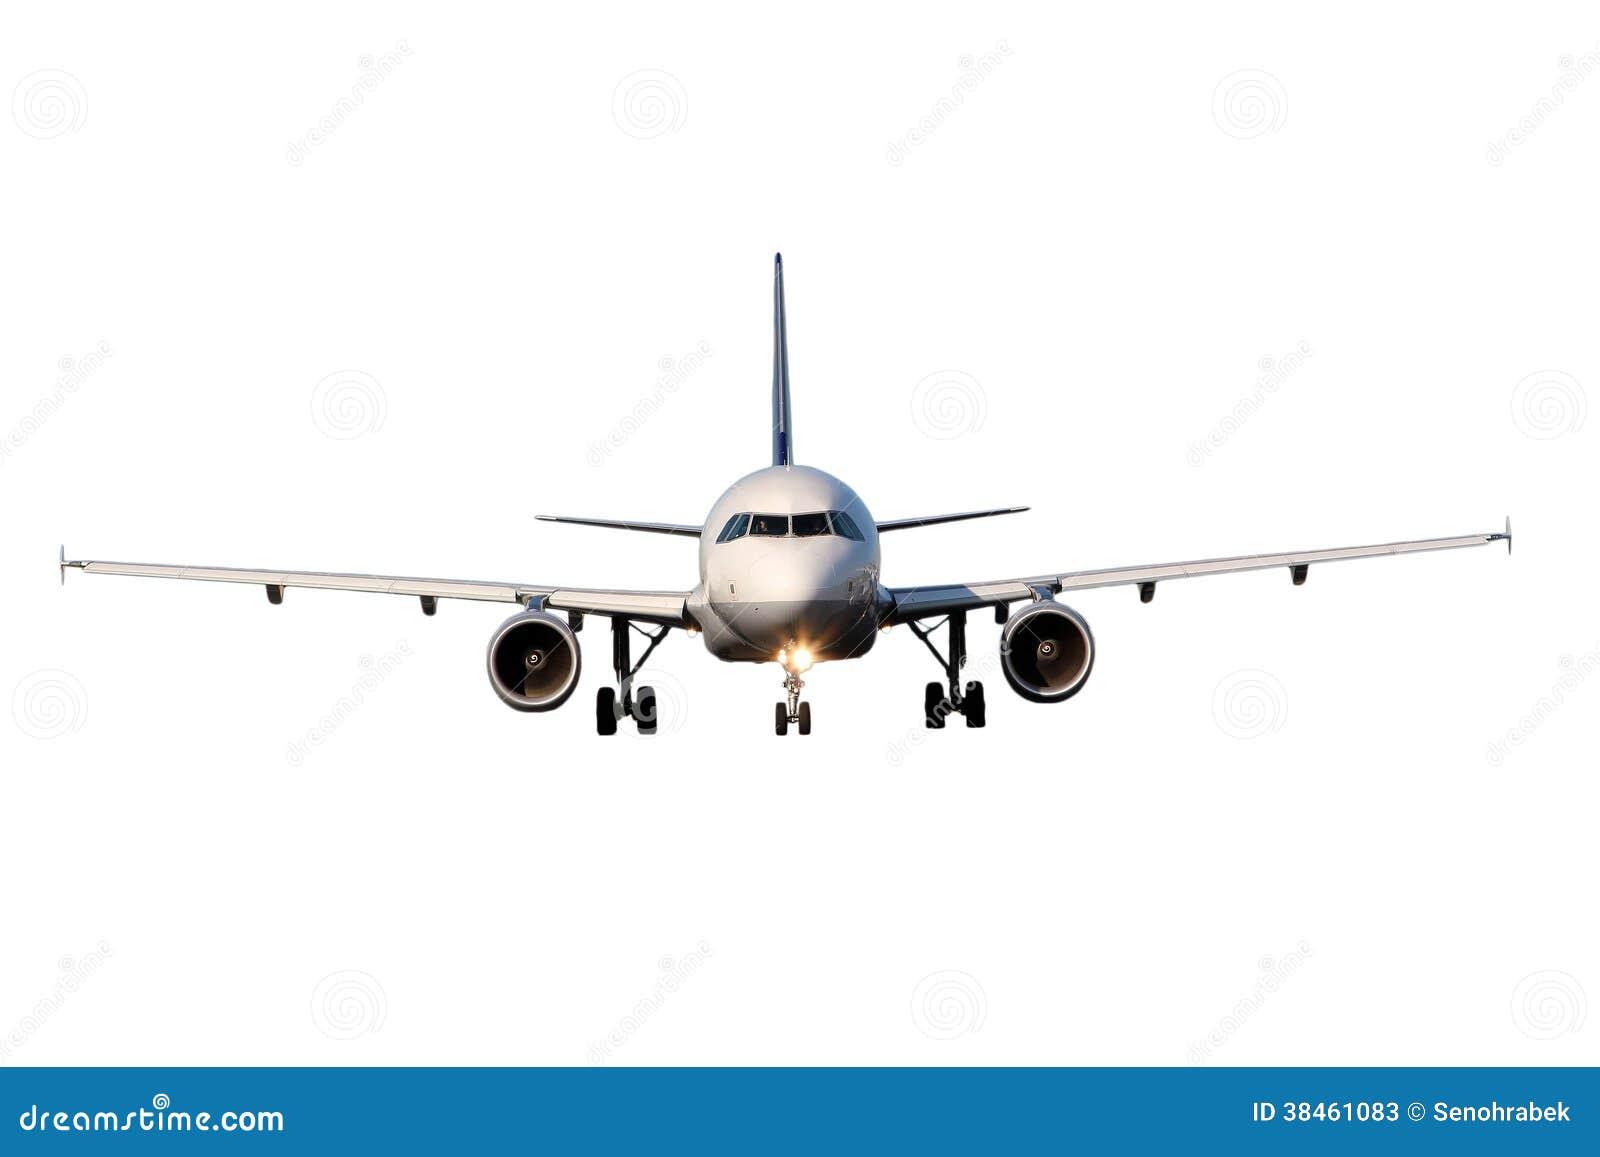 Aircraft Isolated On White Background Stock Photos - Image: 38461083